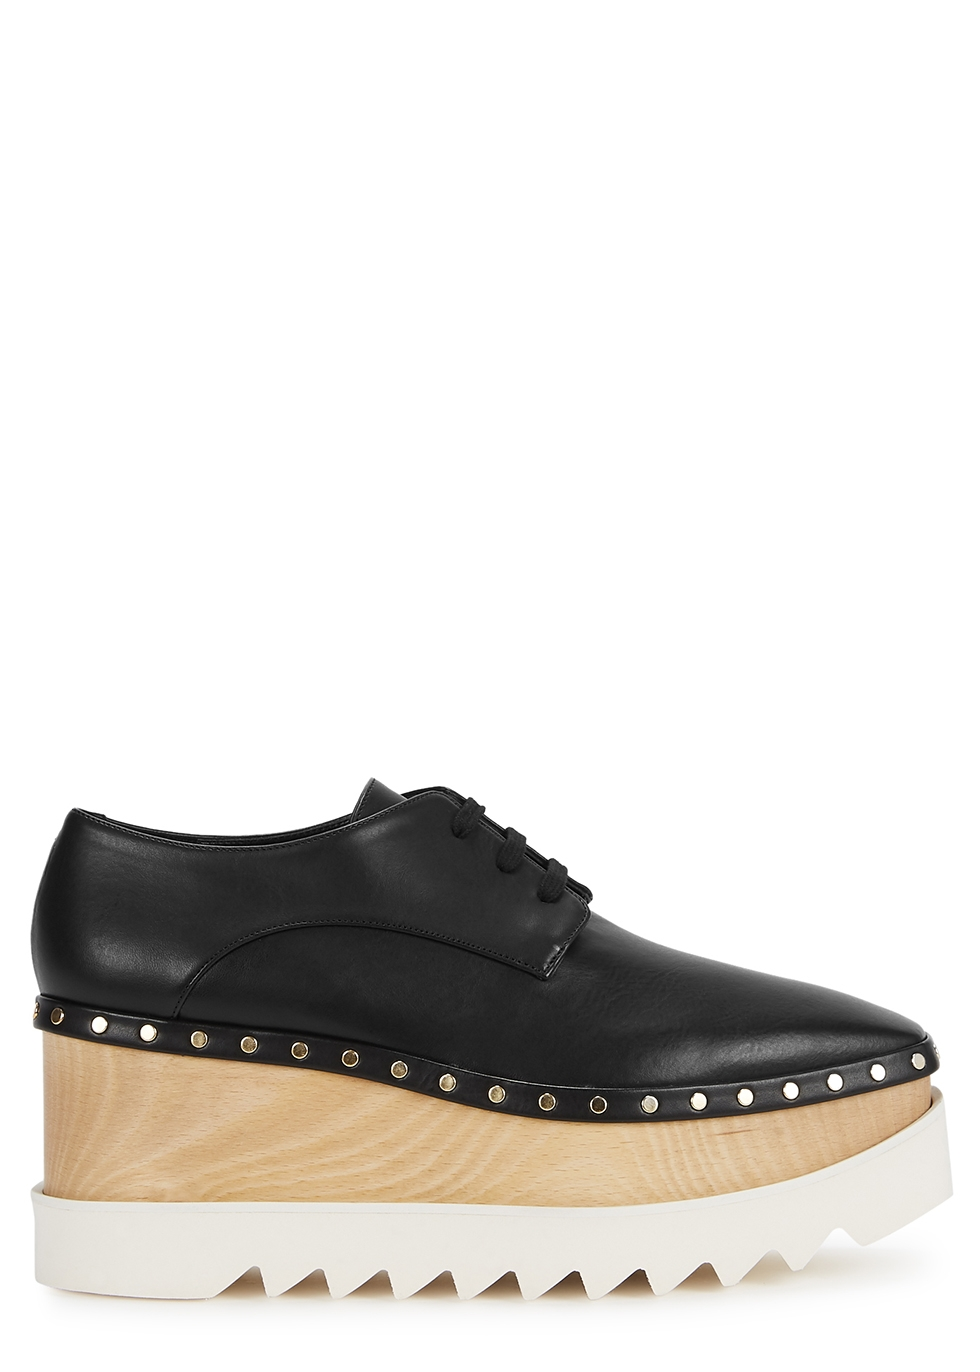 Elyse 80 black faux leather Derby shoes